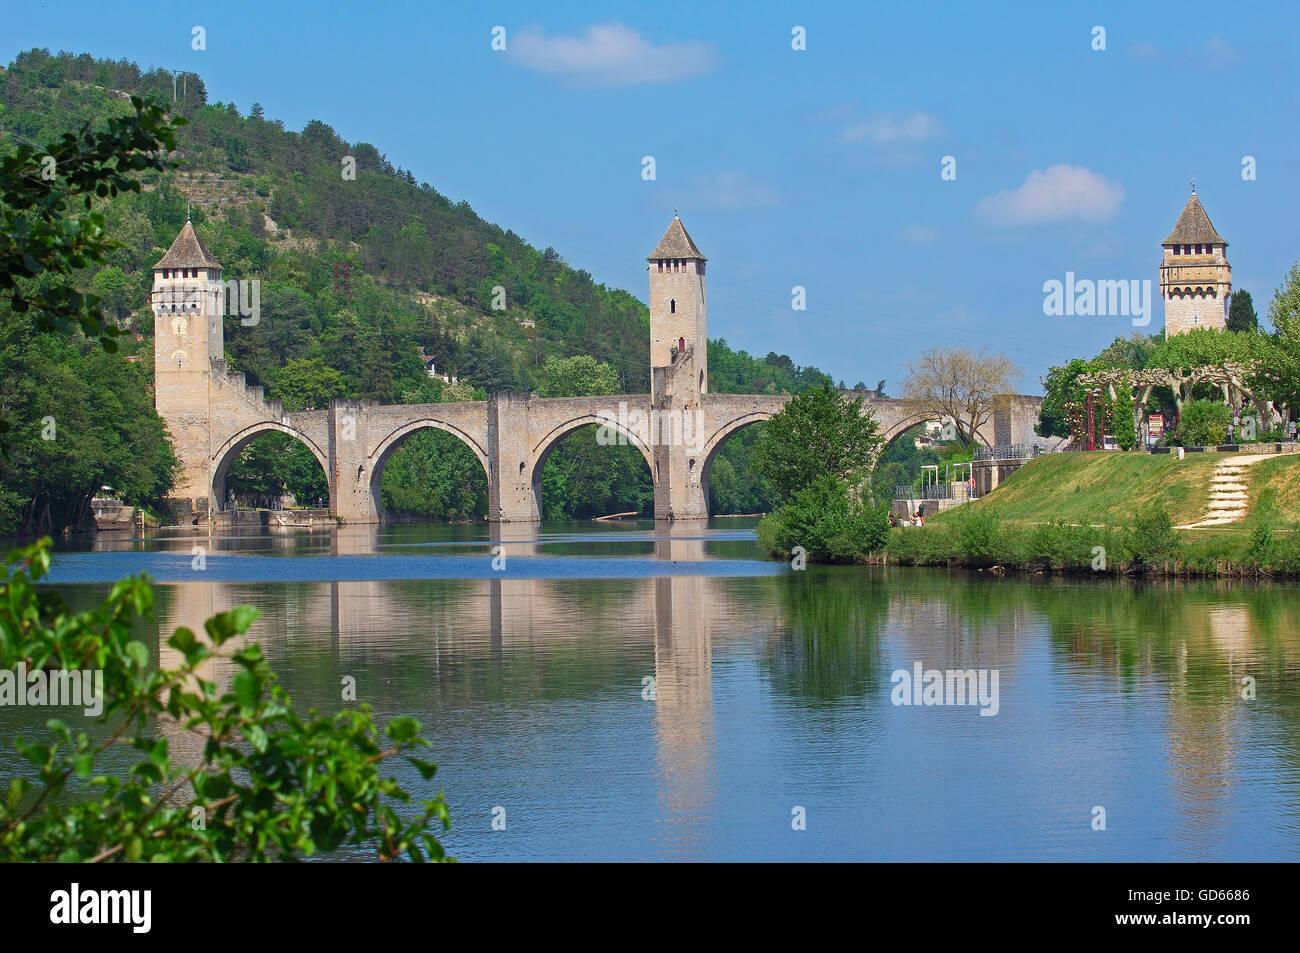 Cahors, Valentre bridge, Pont Valentre, Lot River, Lot departament, Quercy, Via Podiensis, Way of St, James, Camino - Stock Image